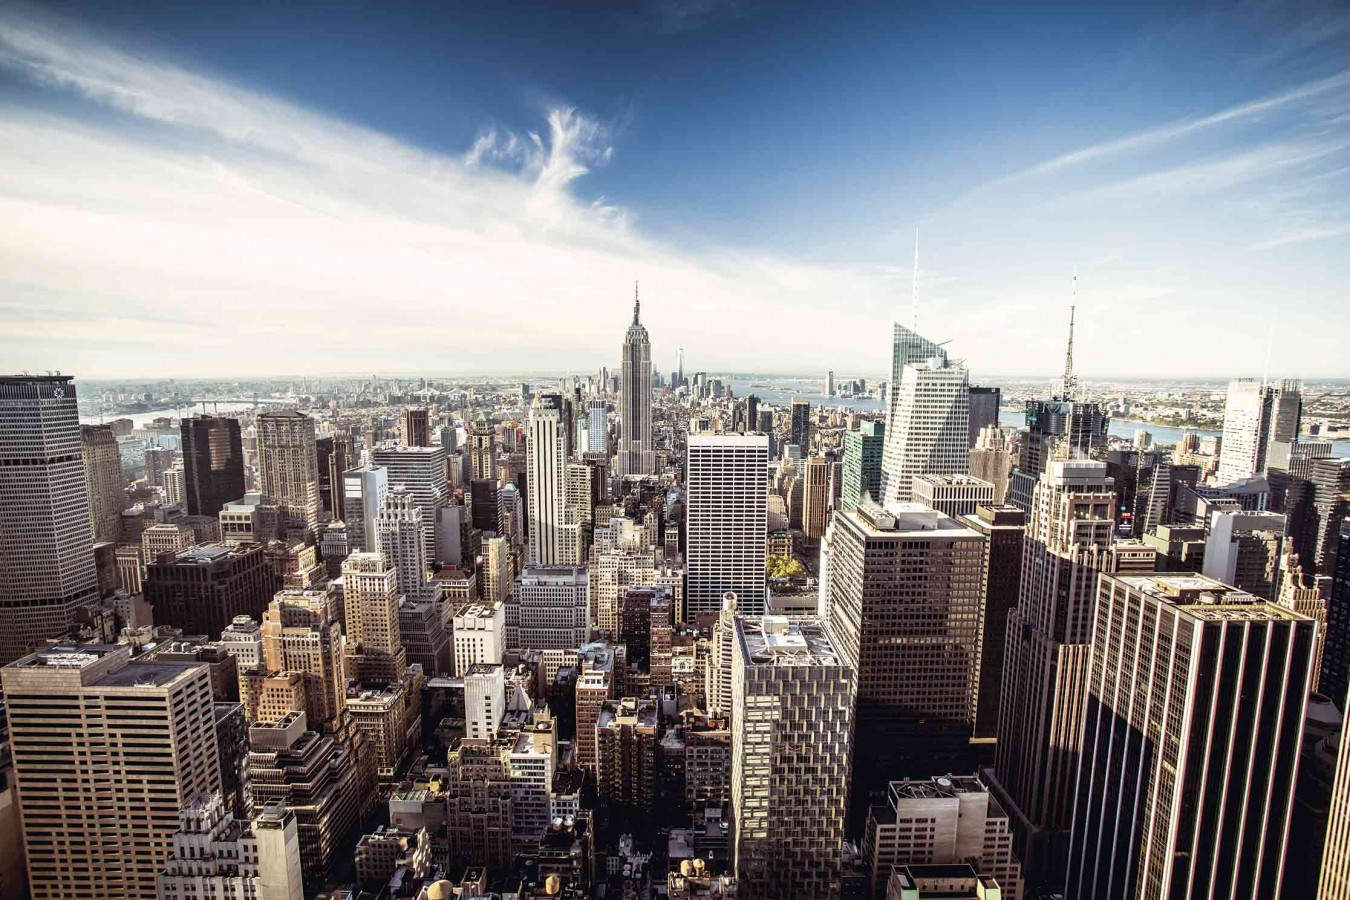 Fotomural Life in NY A08-M882 Fotomural Life in NY A08-M882